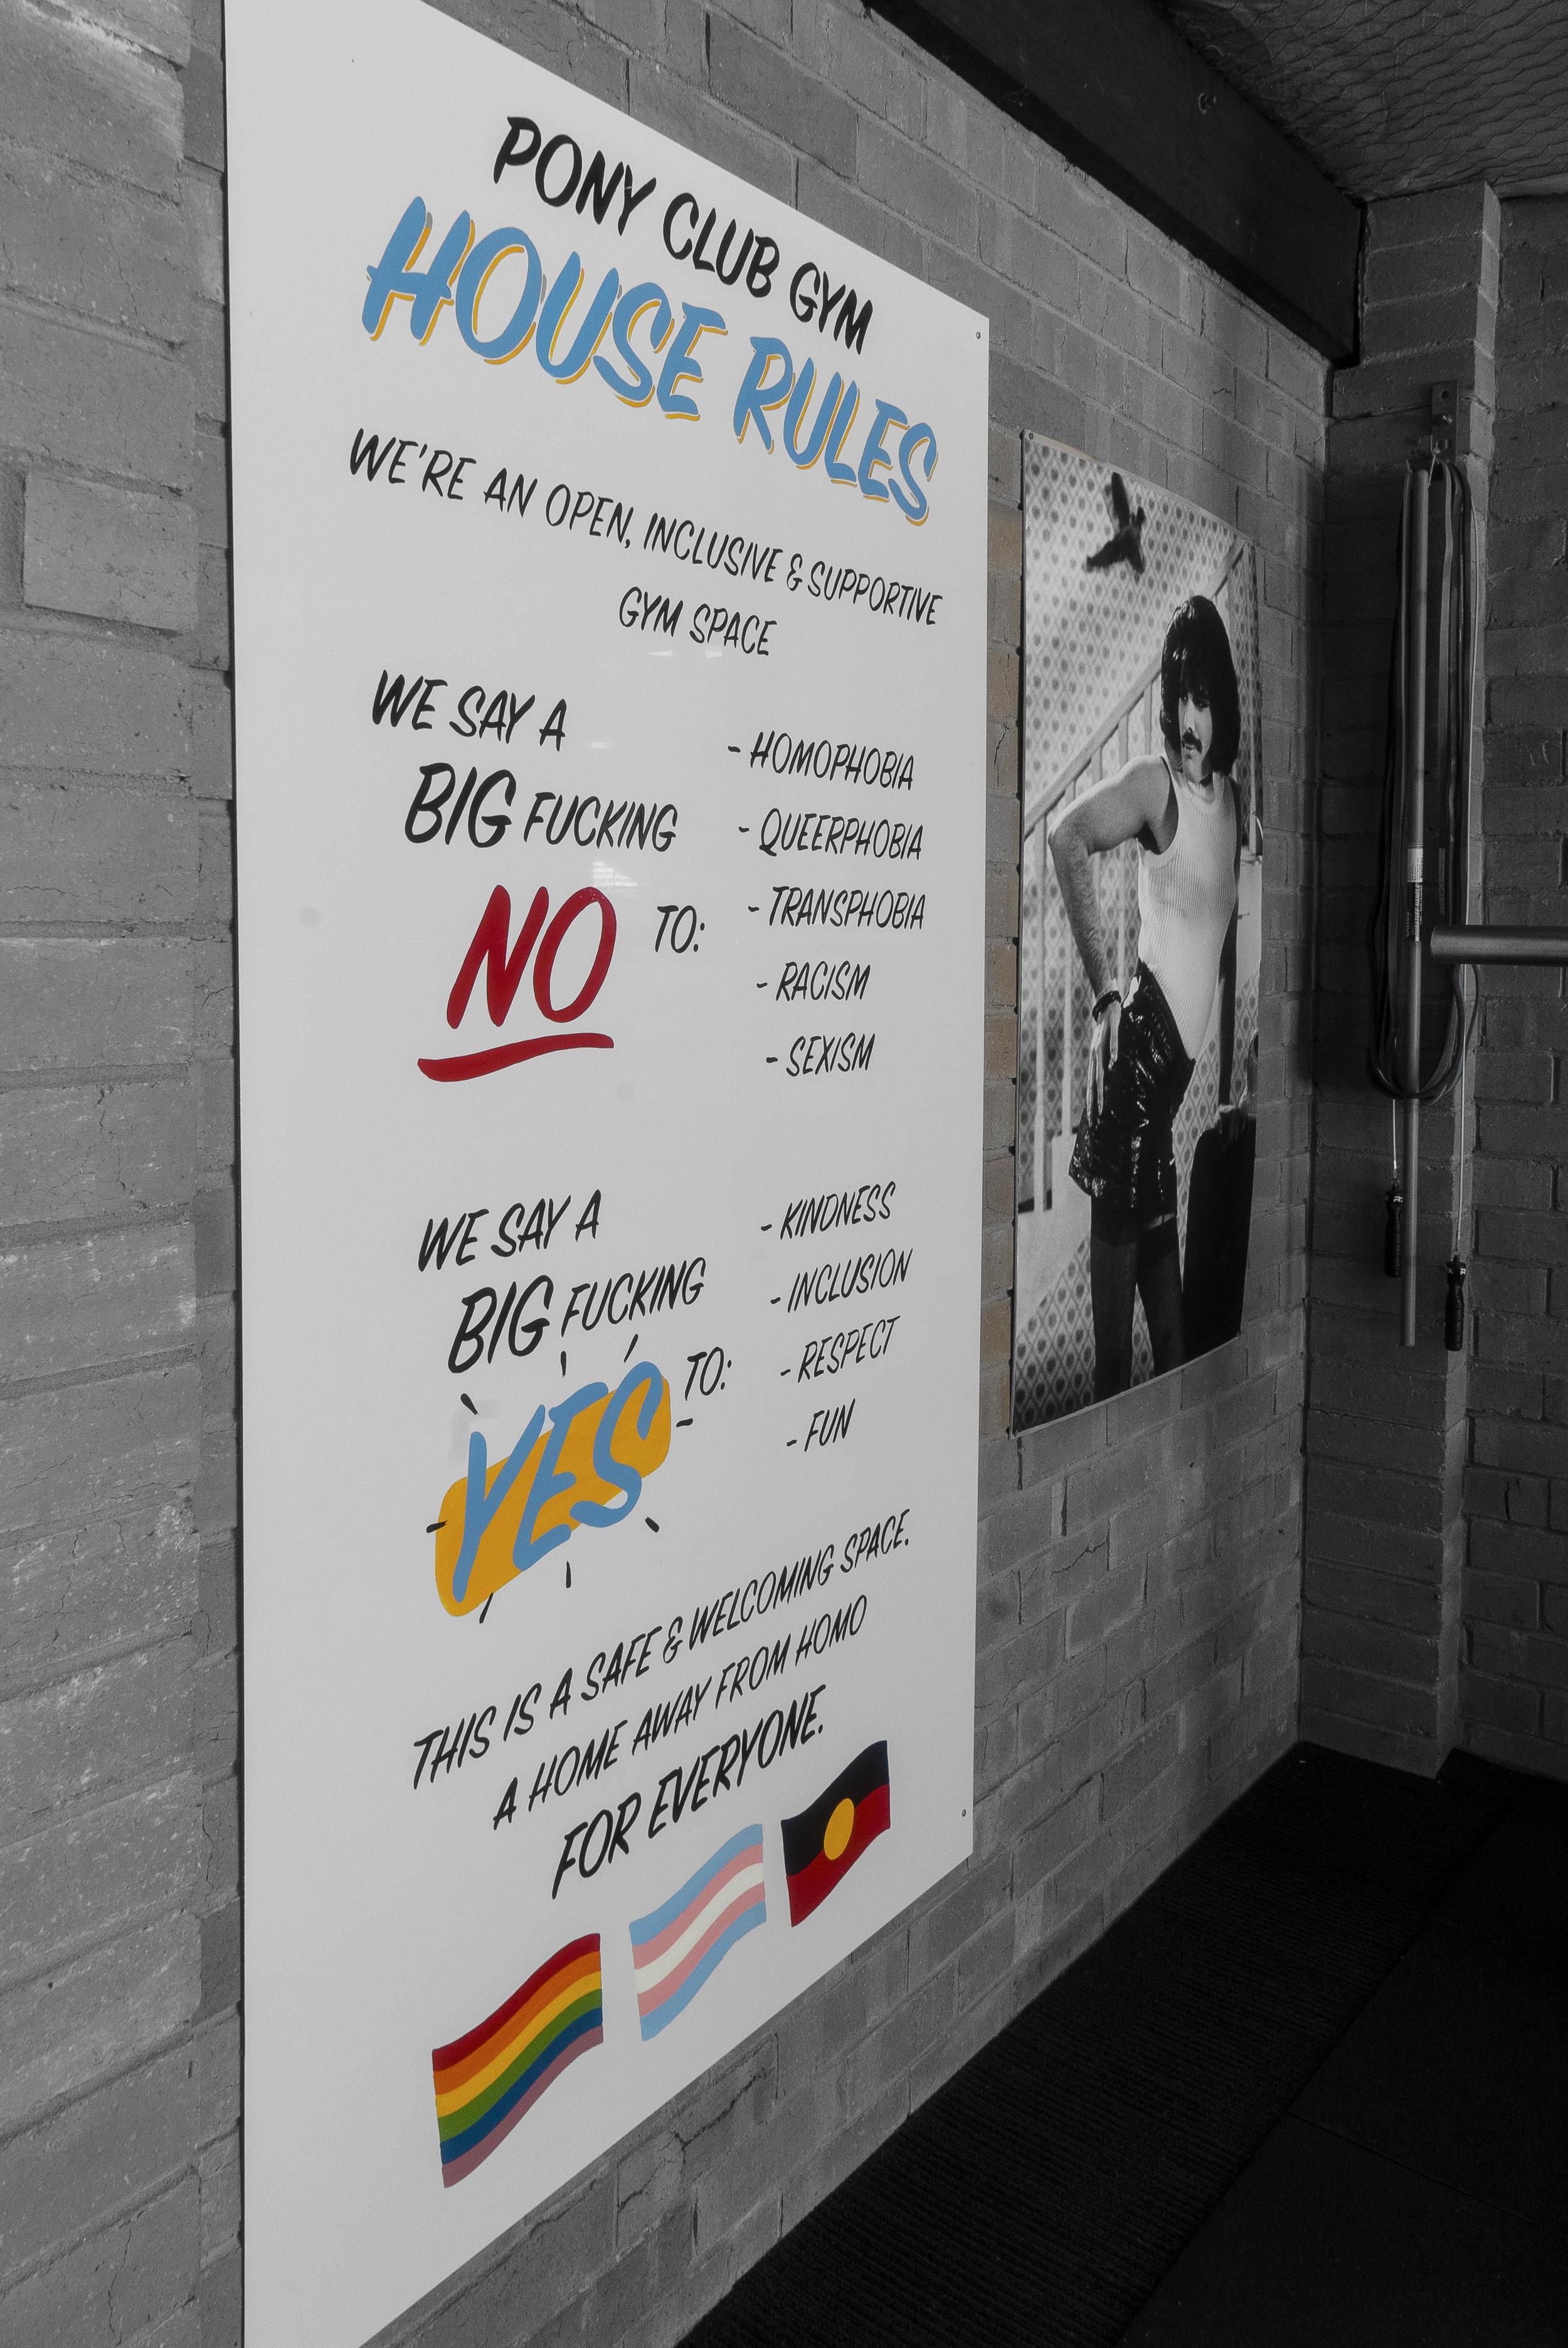 Gym_Rules.jpg